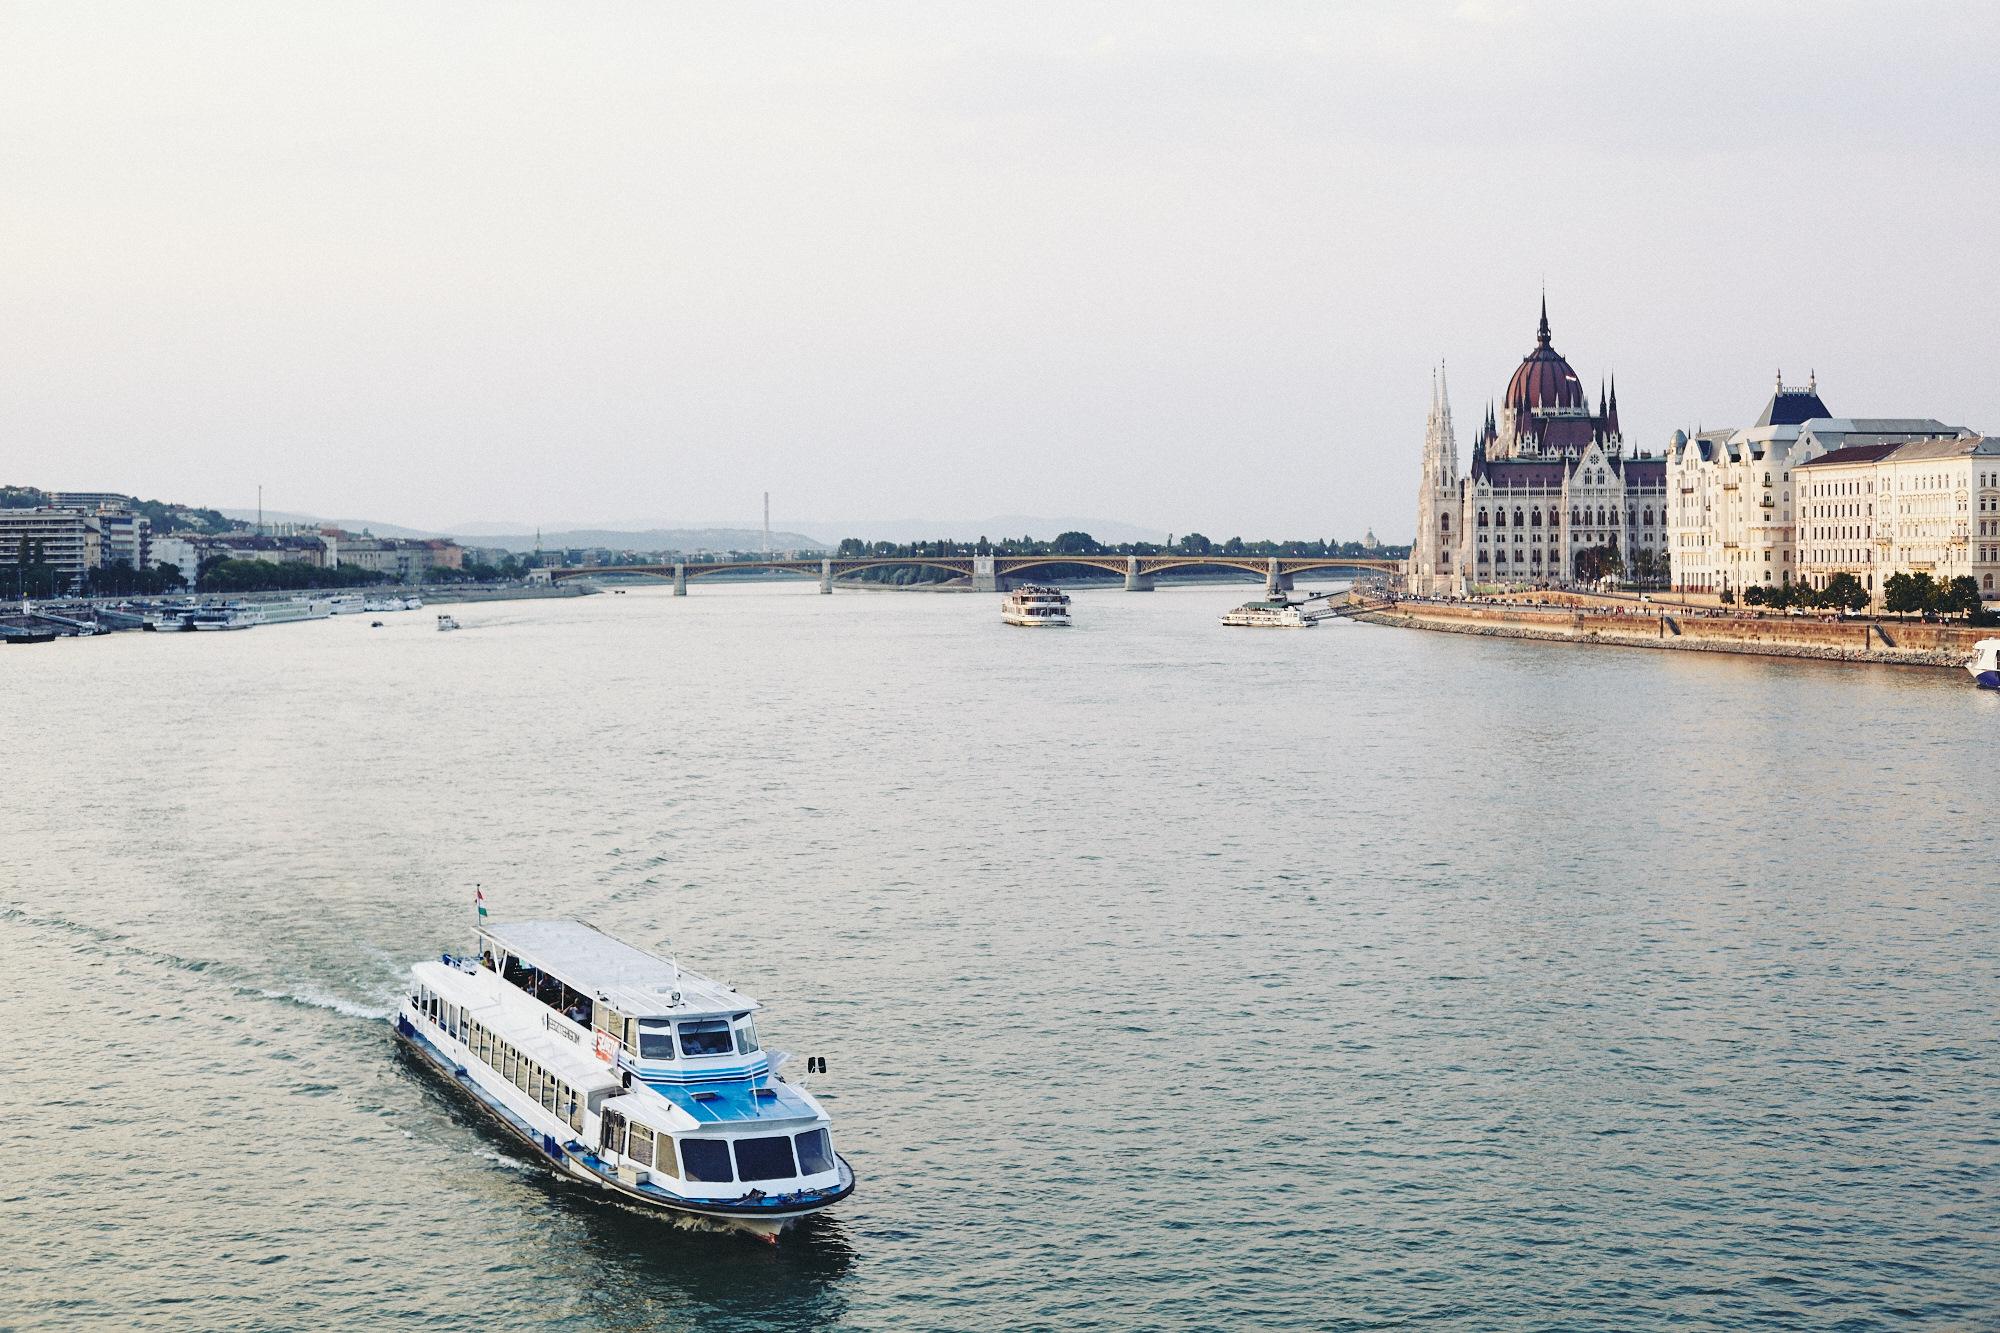 maxmotel_budapest_aug2015_day02_14_danube_bridge_1364